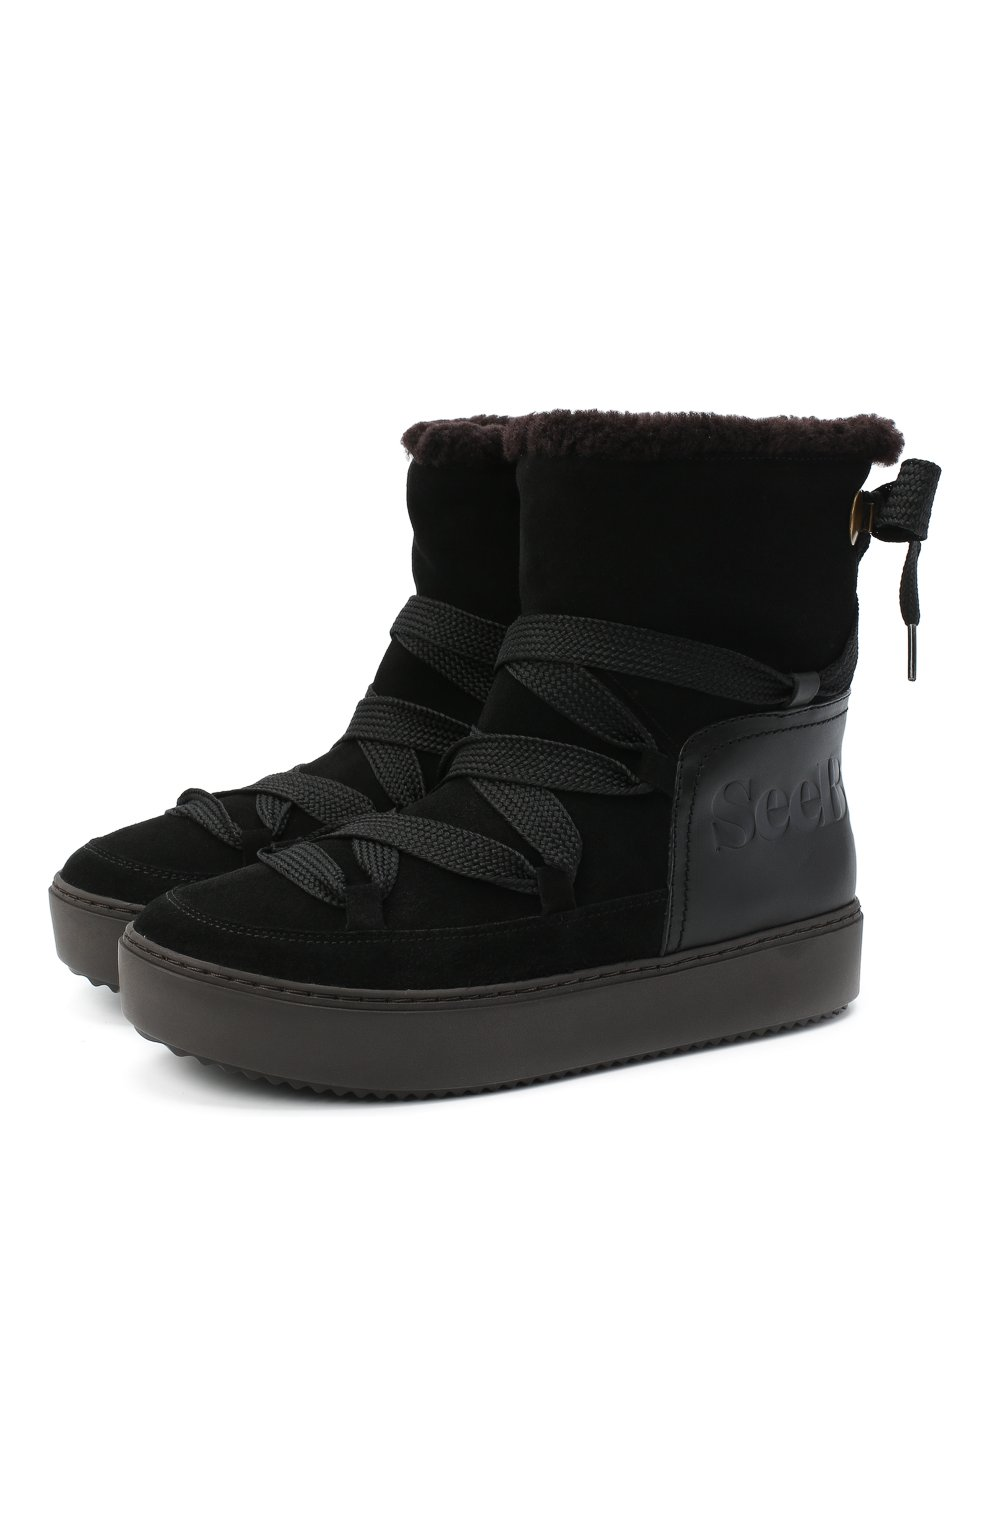 Женские замшевые ботинки SEE BY CHLOÉ черного цвета, арт. SB35151A/12230 | Фото 1